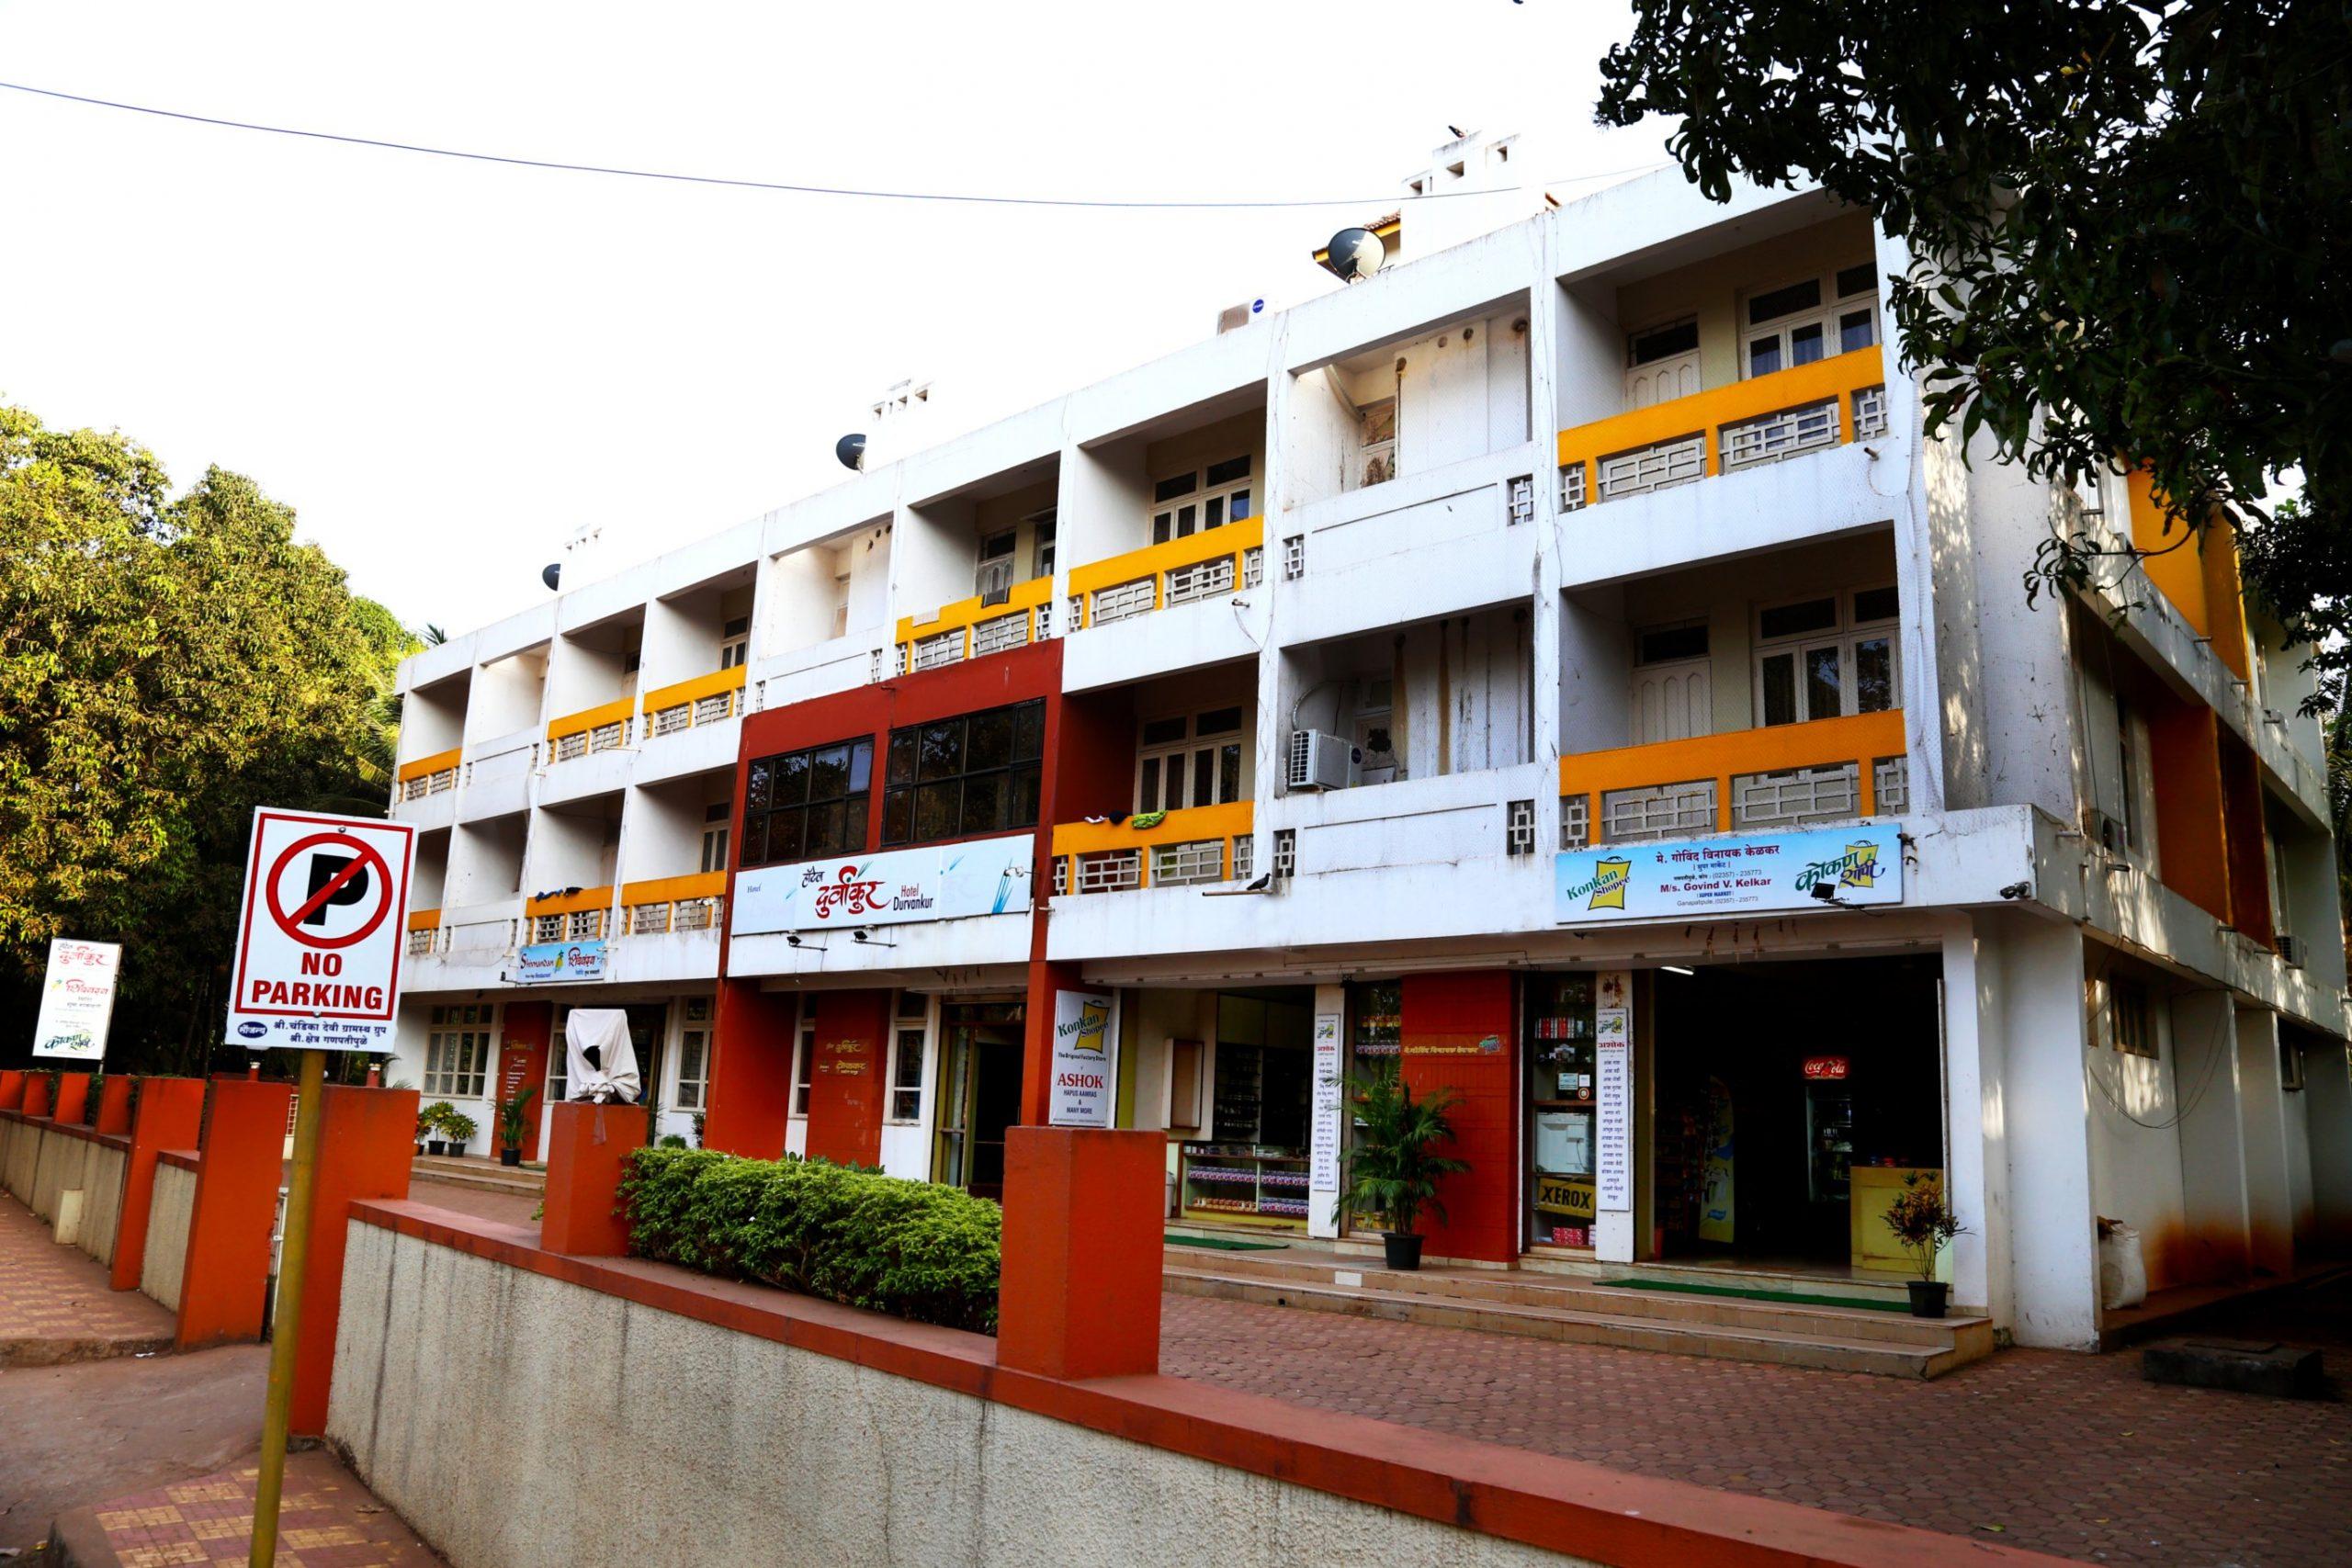 Hotel Durvankal - Popular Stay Options in Ganpatipule Top Hotels and Resorts